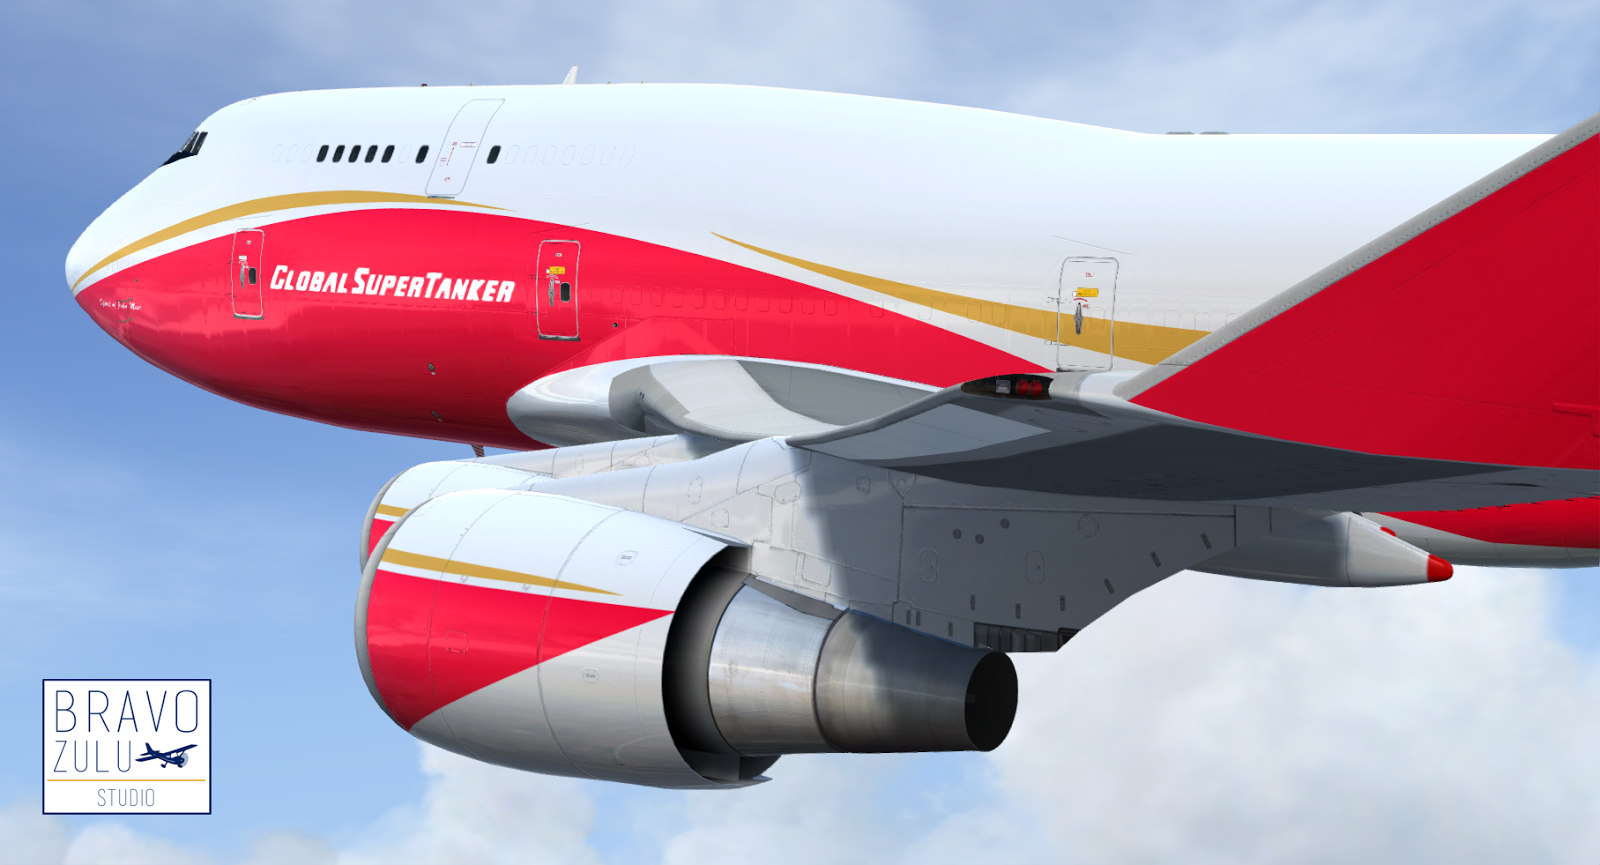 torrent pmdg 747-400x - torrent pmdg 747-400x-1